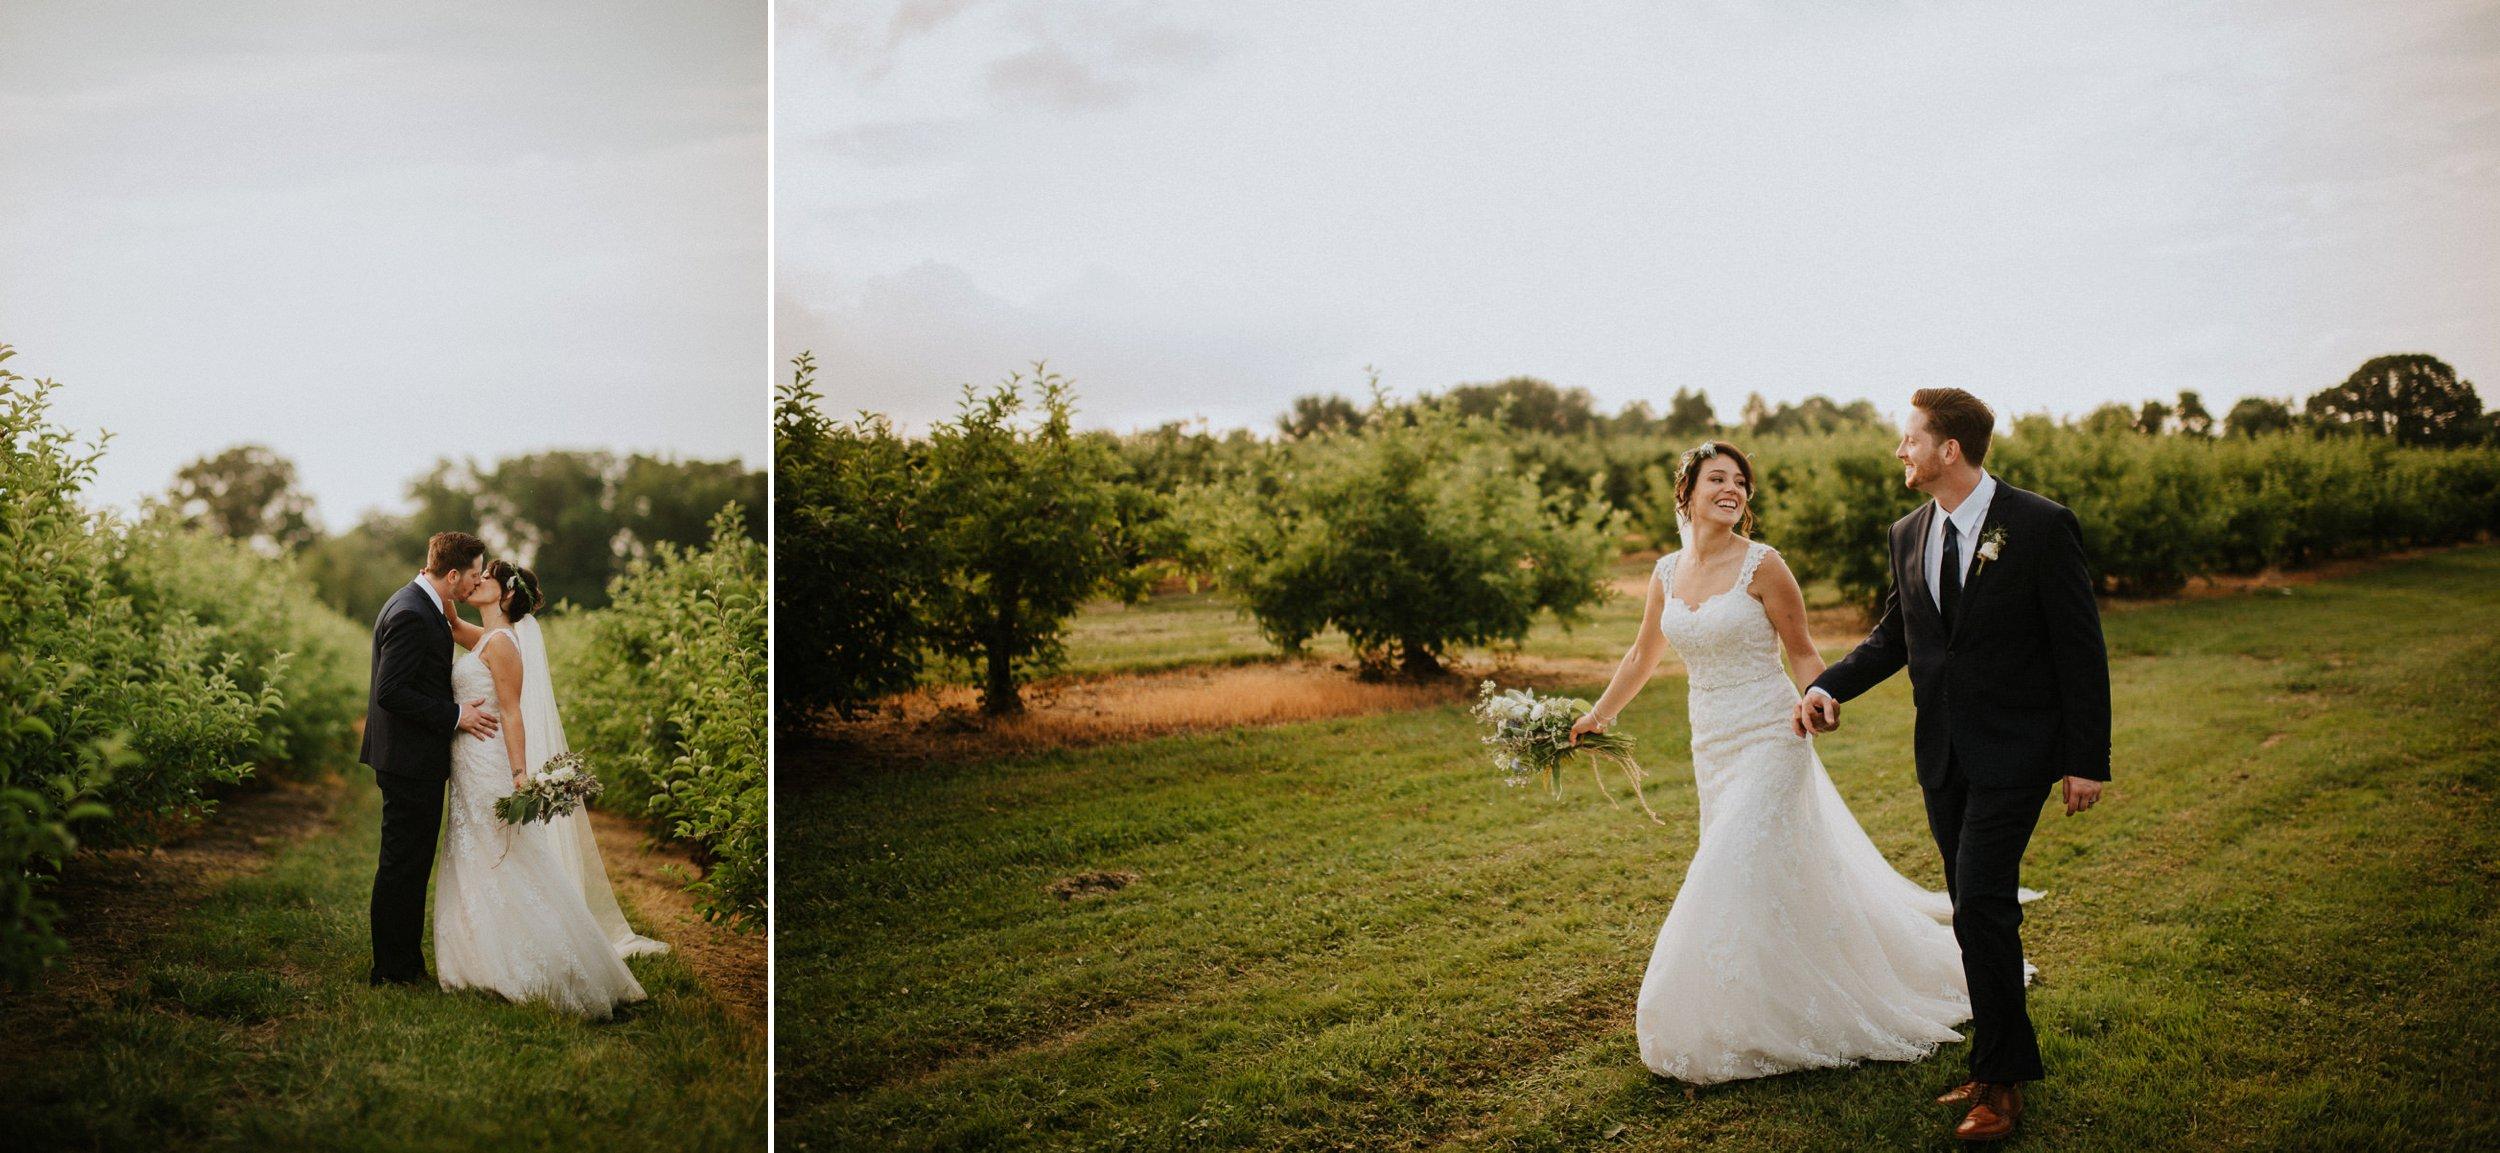 milburn_farms-wedding-67.jpg